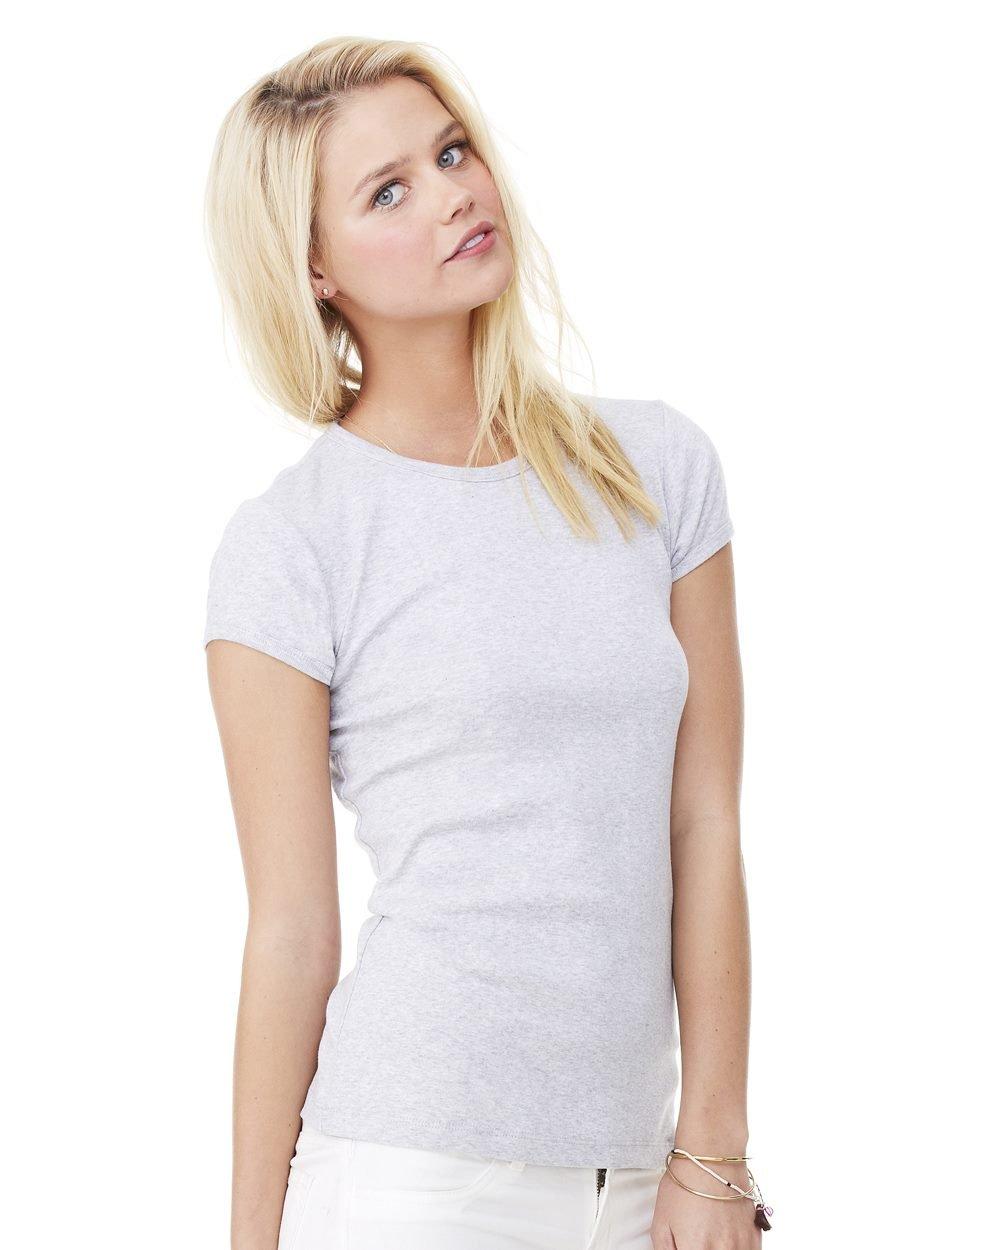 df9c175a Bella and Canvas Ladies' Baby Rib Short Sleeve T-Shirt Female Grey